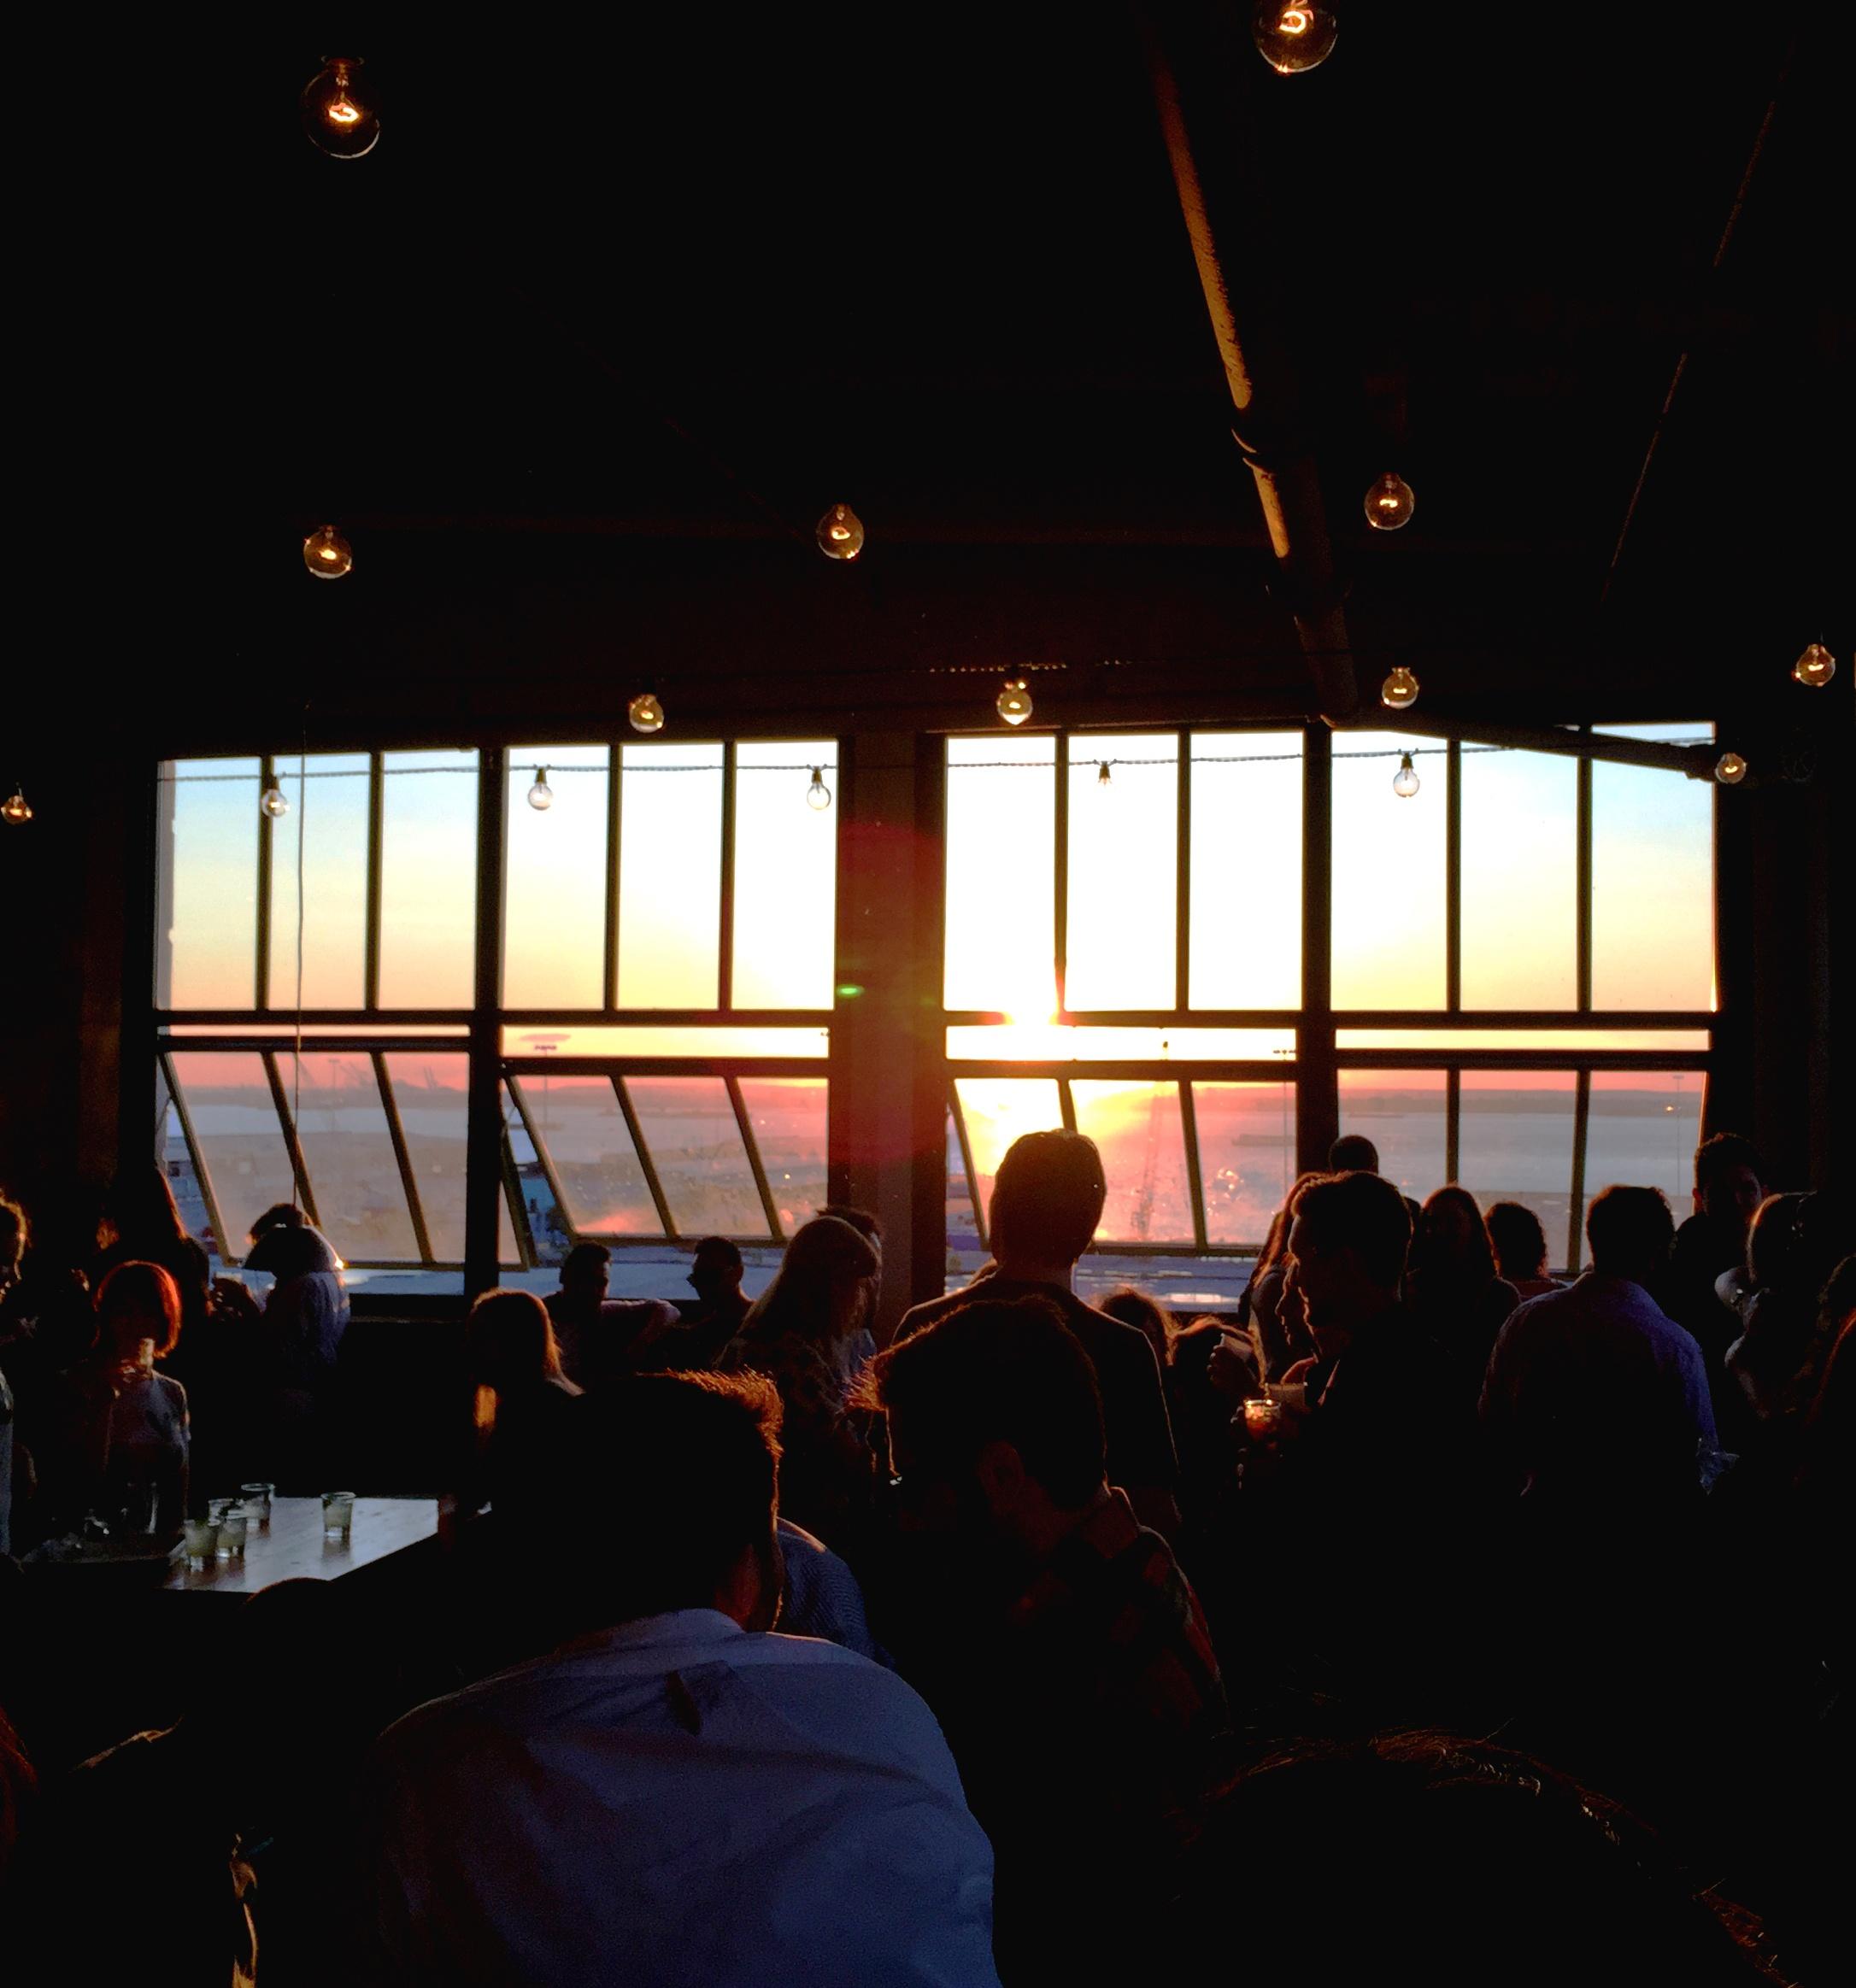 Copy of IMG_5166-sunset-room-promo.jpg